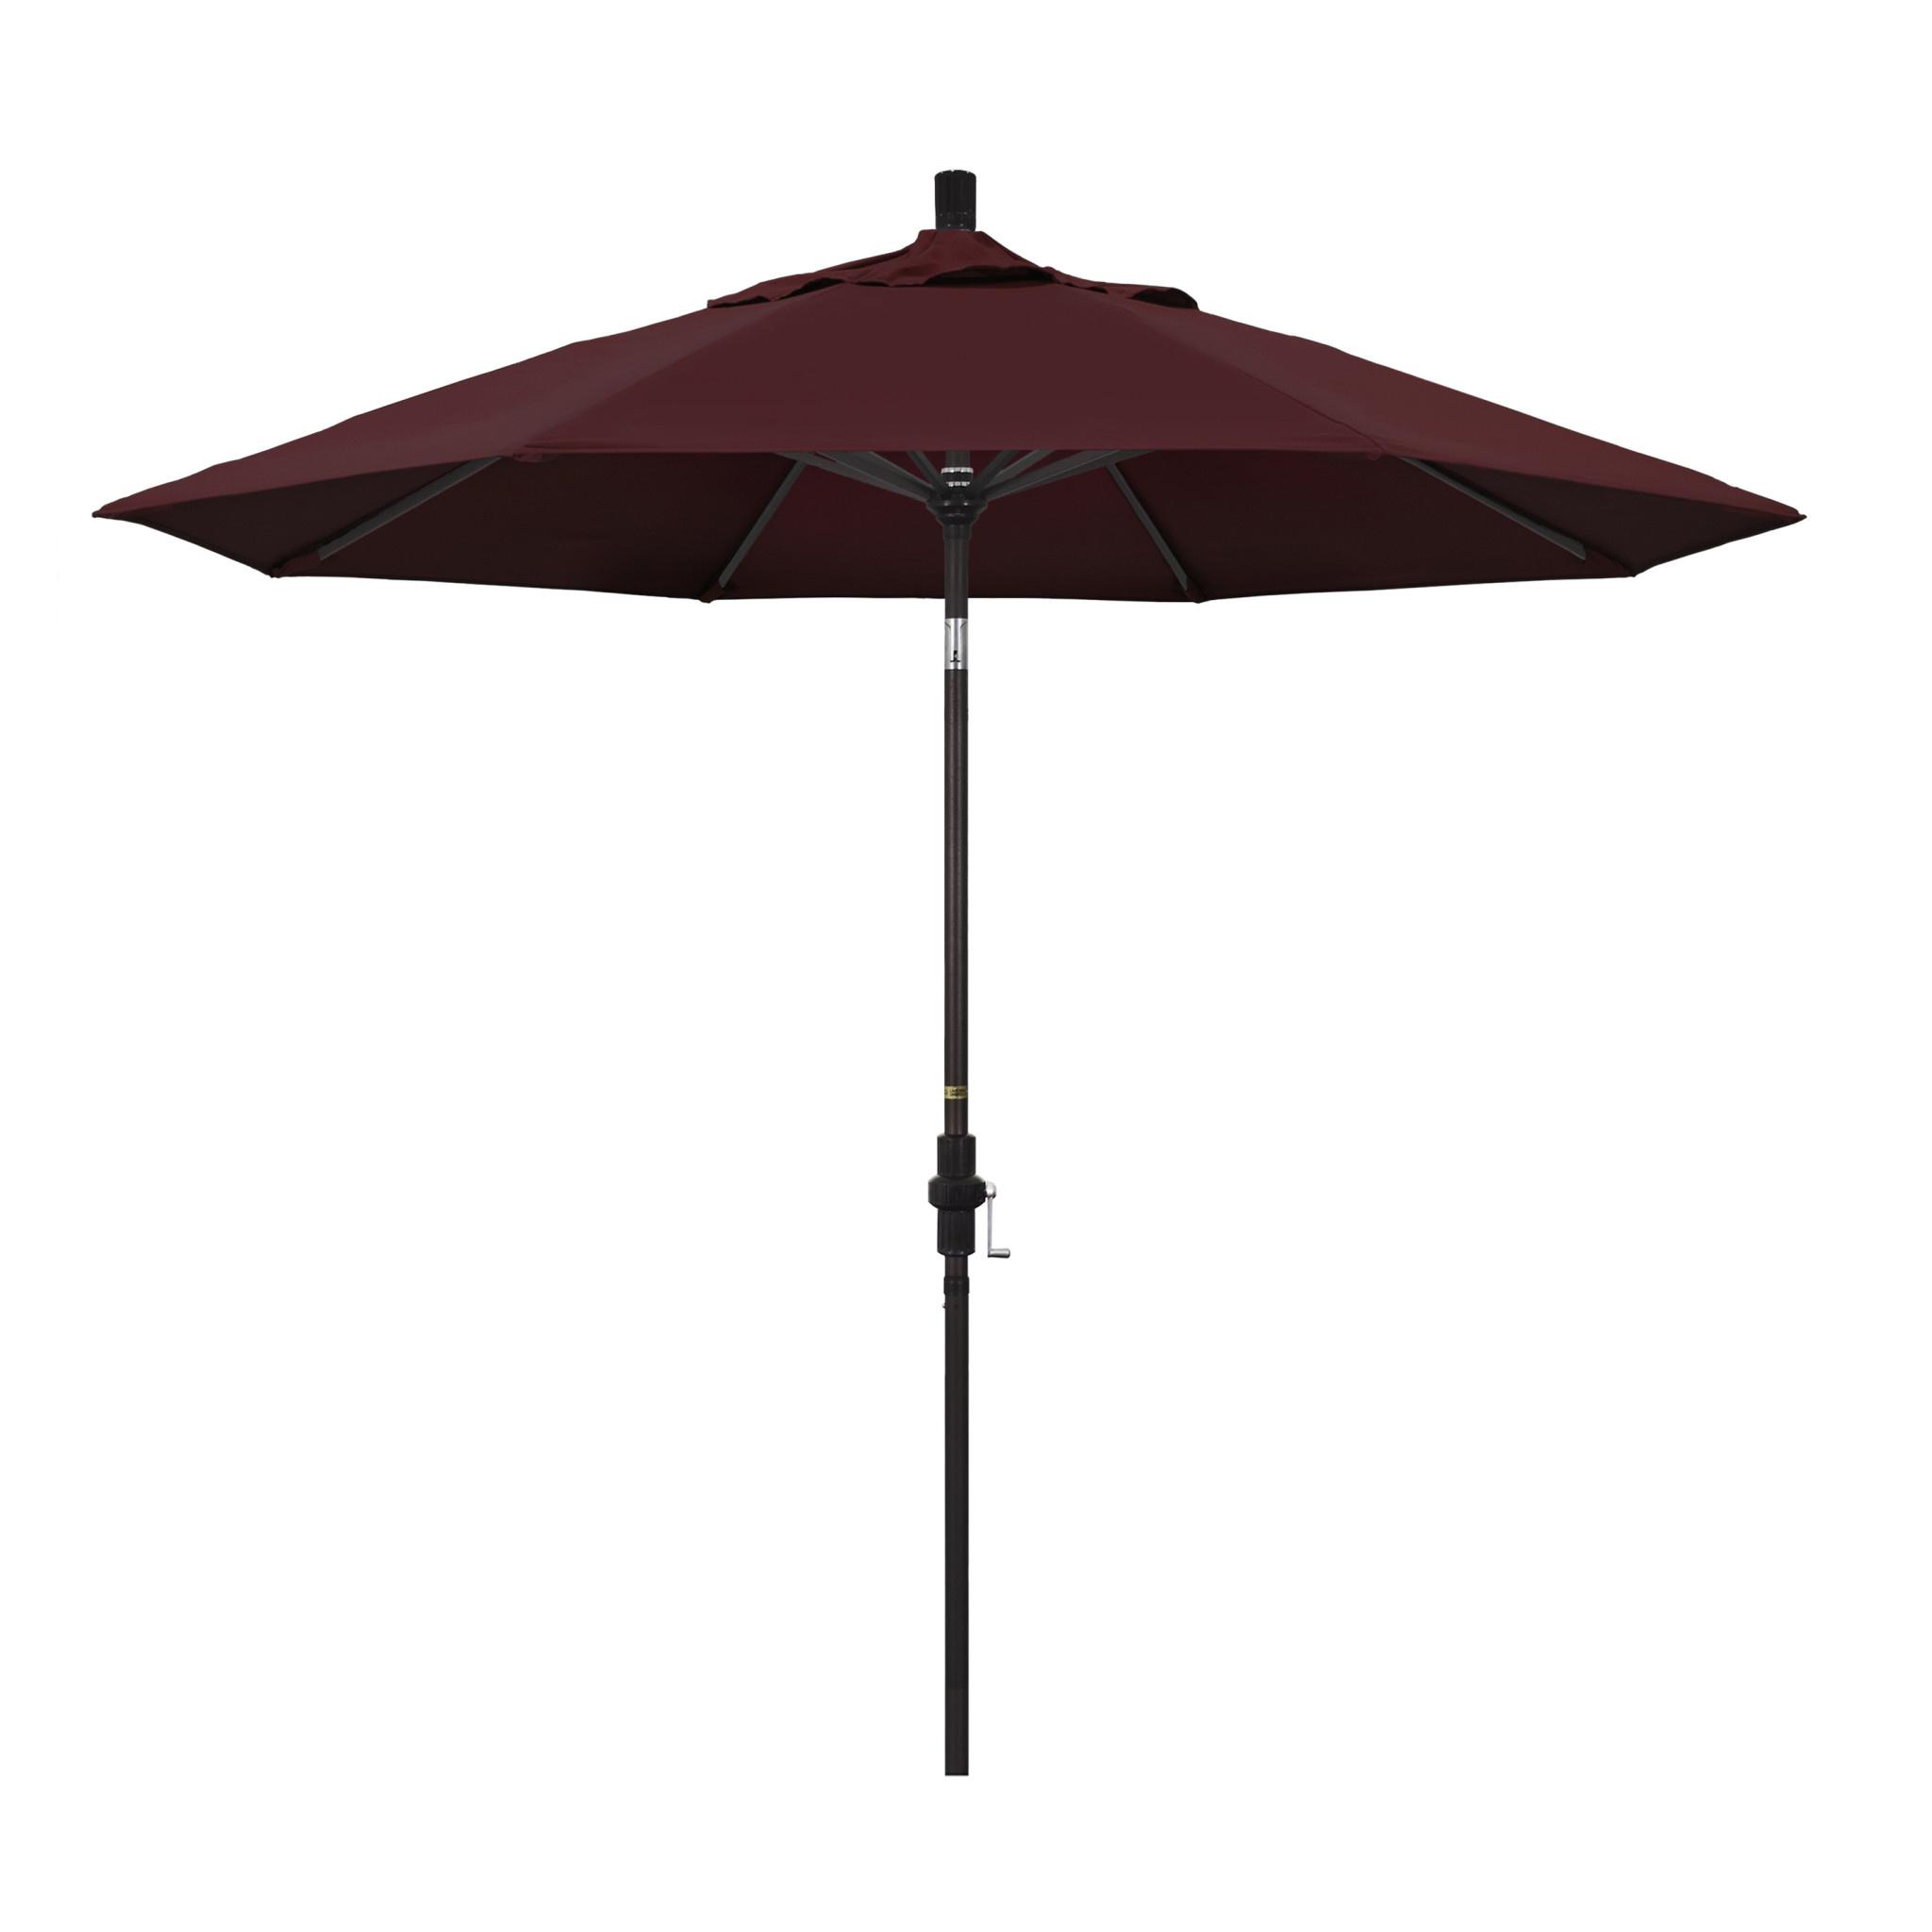 California Umbrella 9' Collar Tilt - Pacifica Burgundy